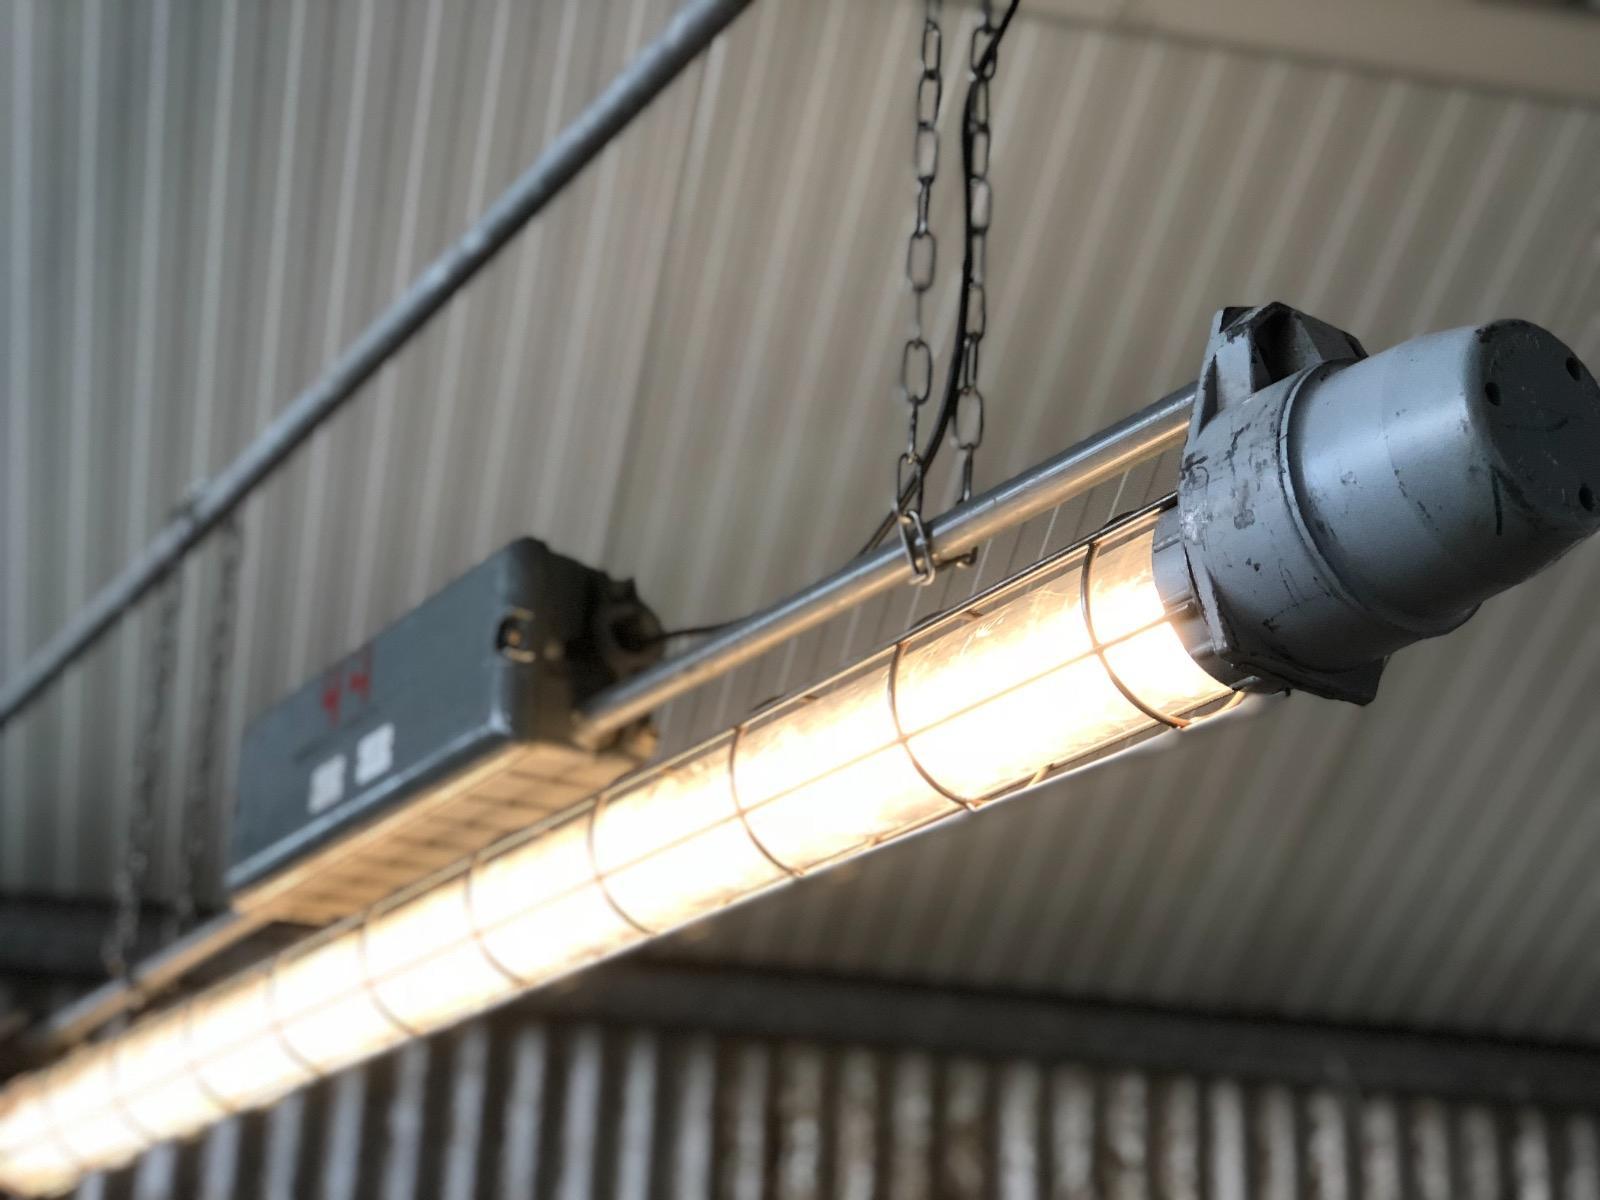 Grey industrial tl led light m long burbri recent added